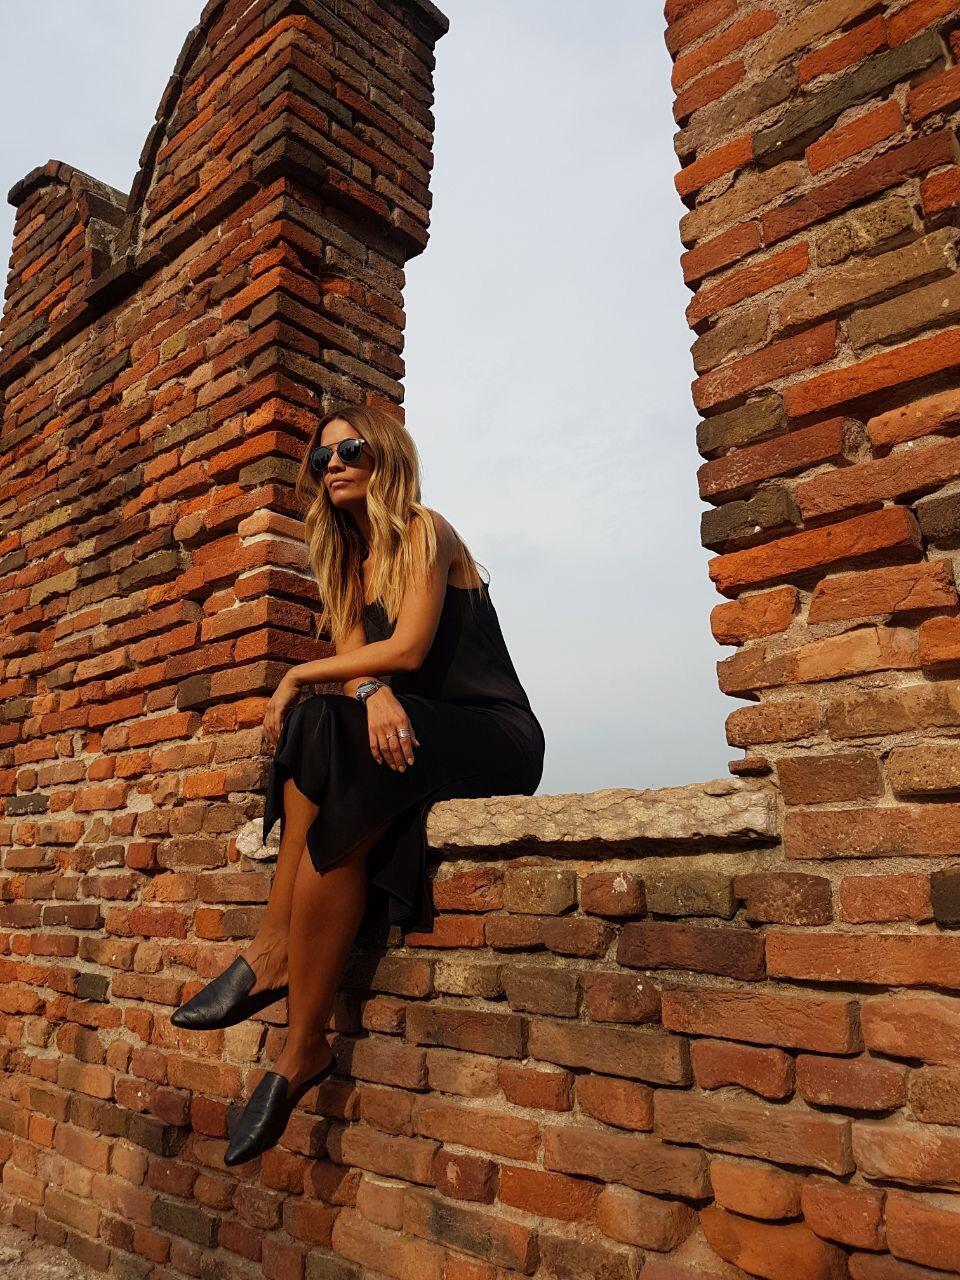 Calzedonia Leg Show F/W 2018: V for Verona